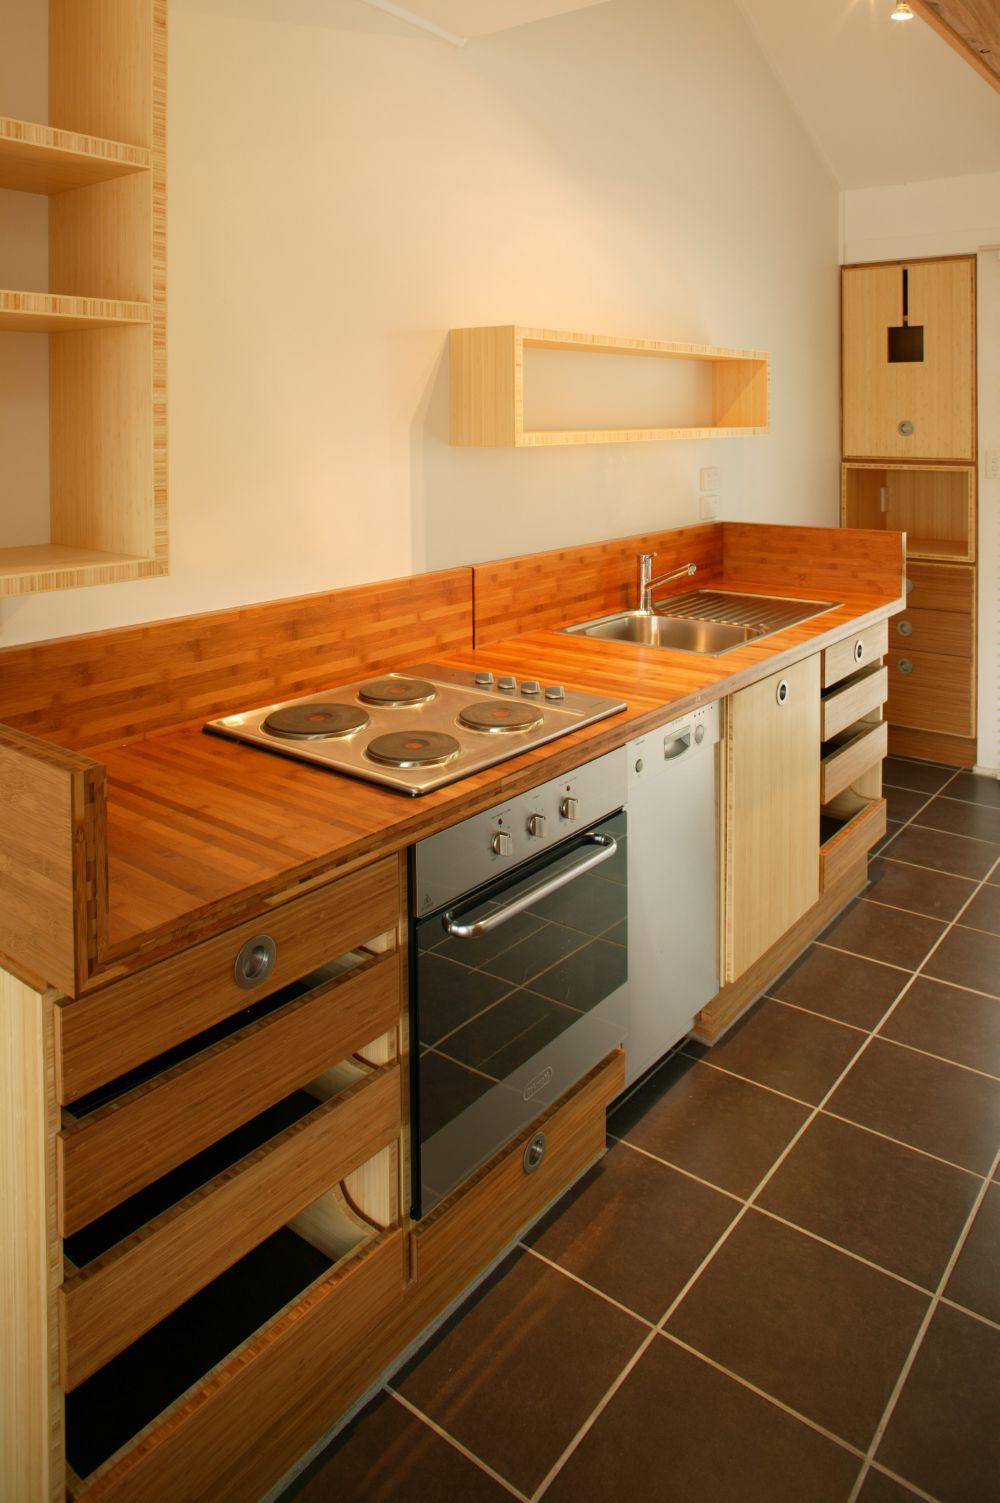 Select custom joinery award winning bamboo kitchen for Bamboo kitchen